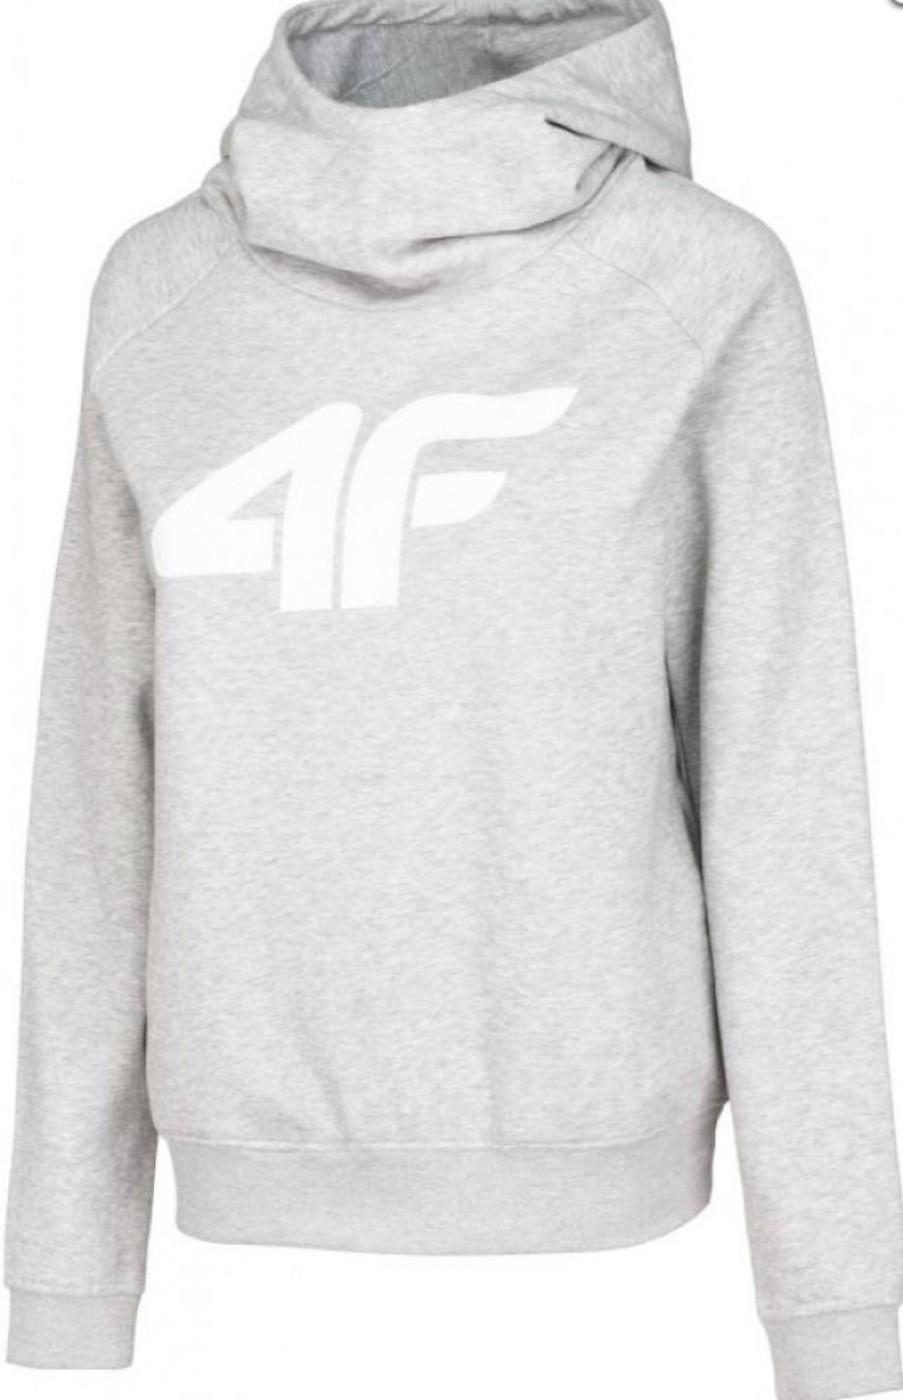 4F Girls Logo Sweater - Kinder